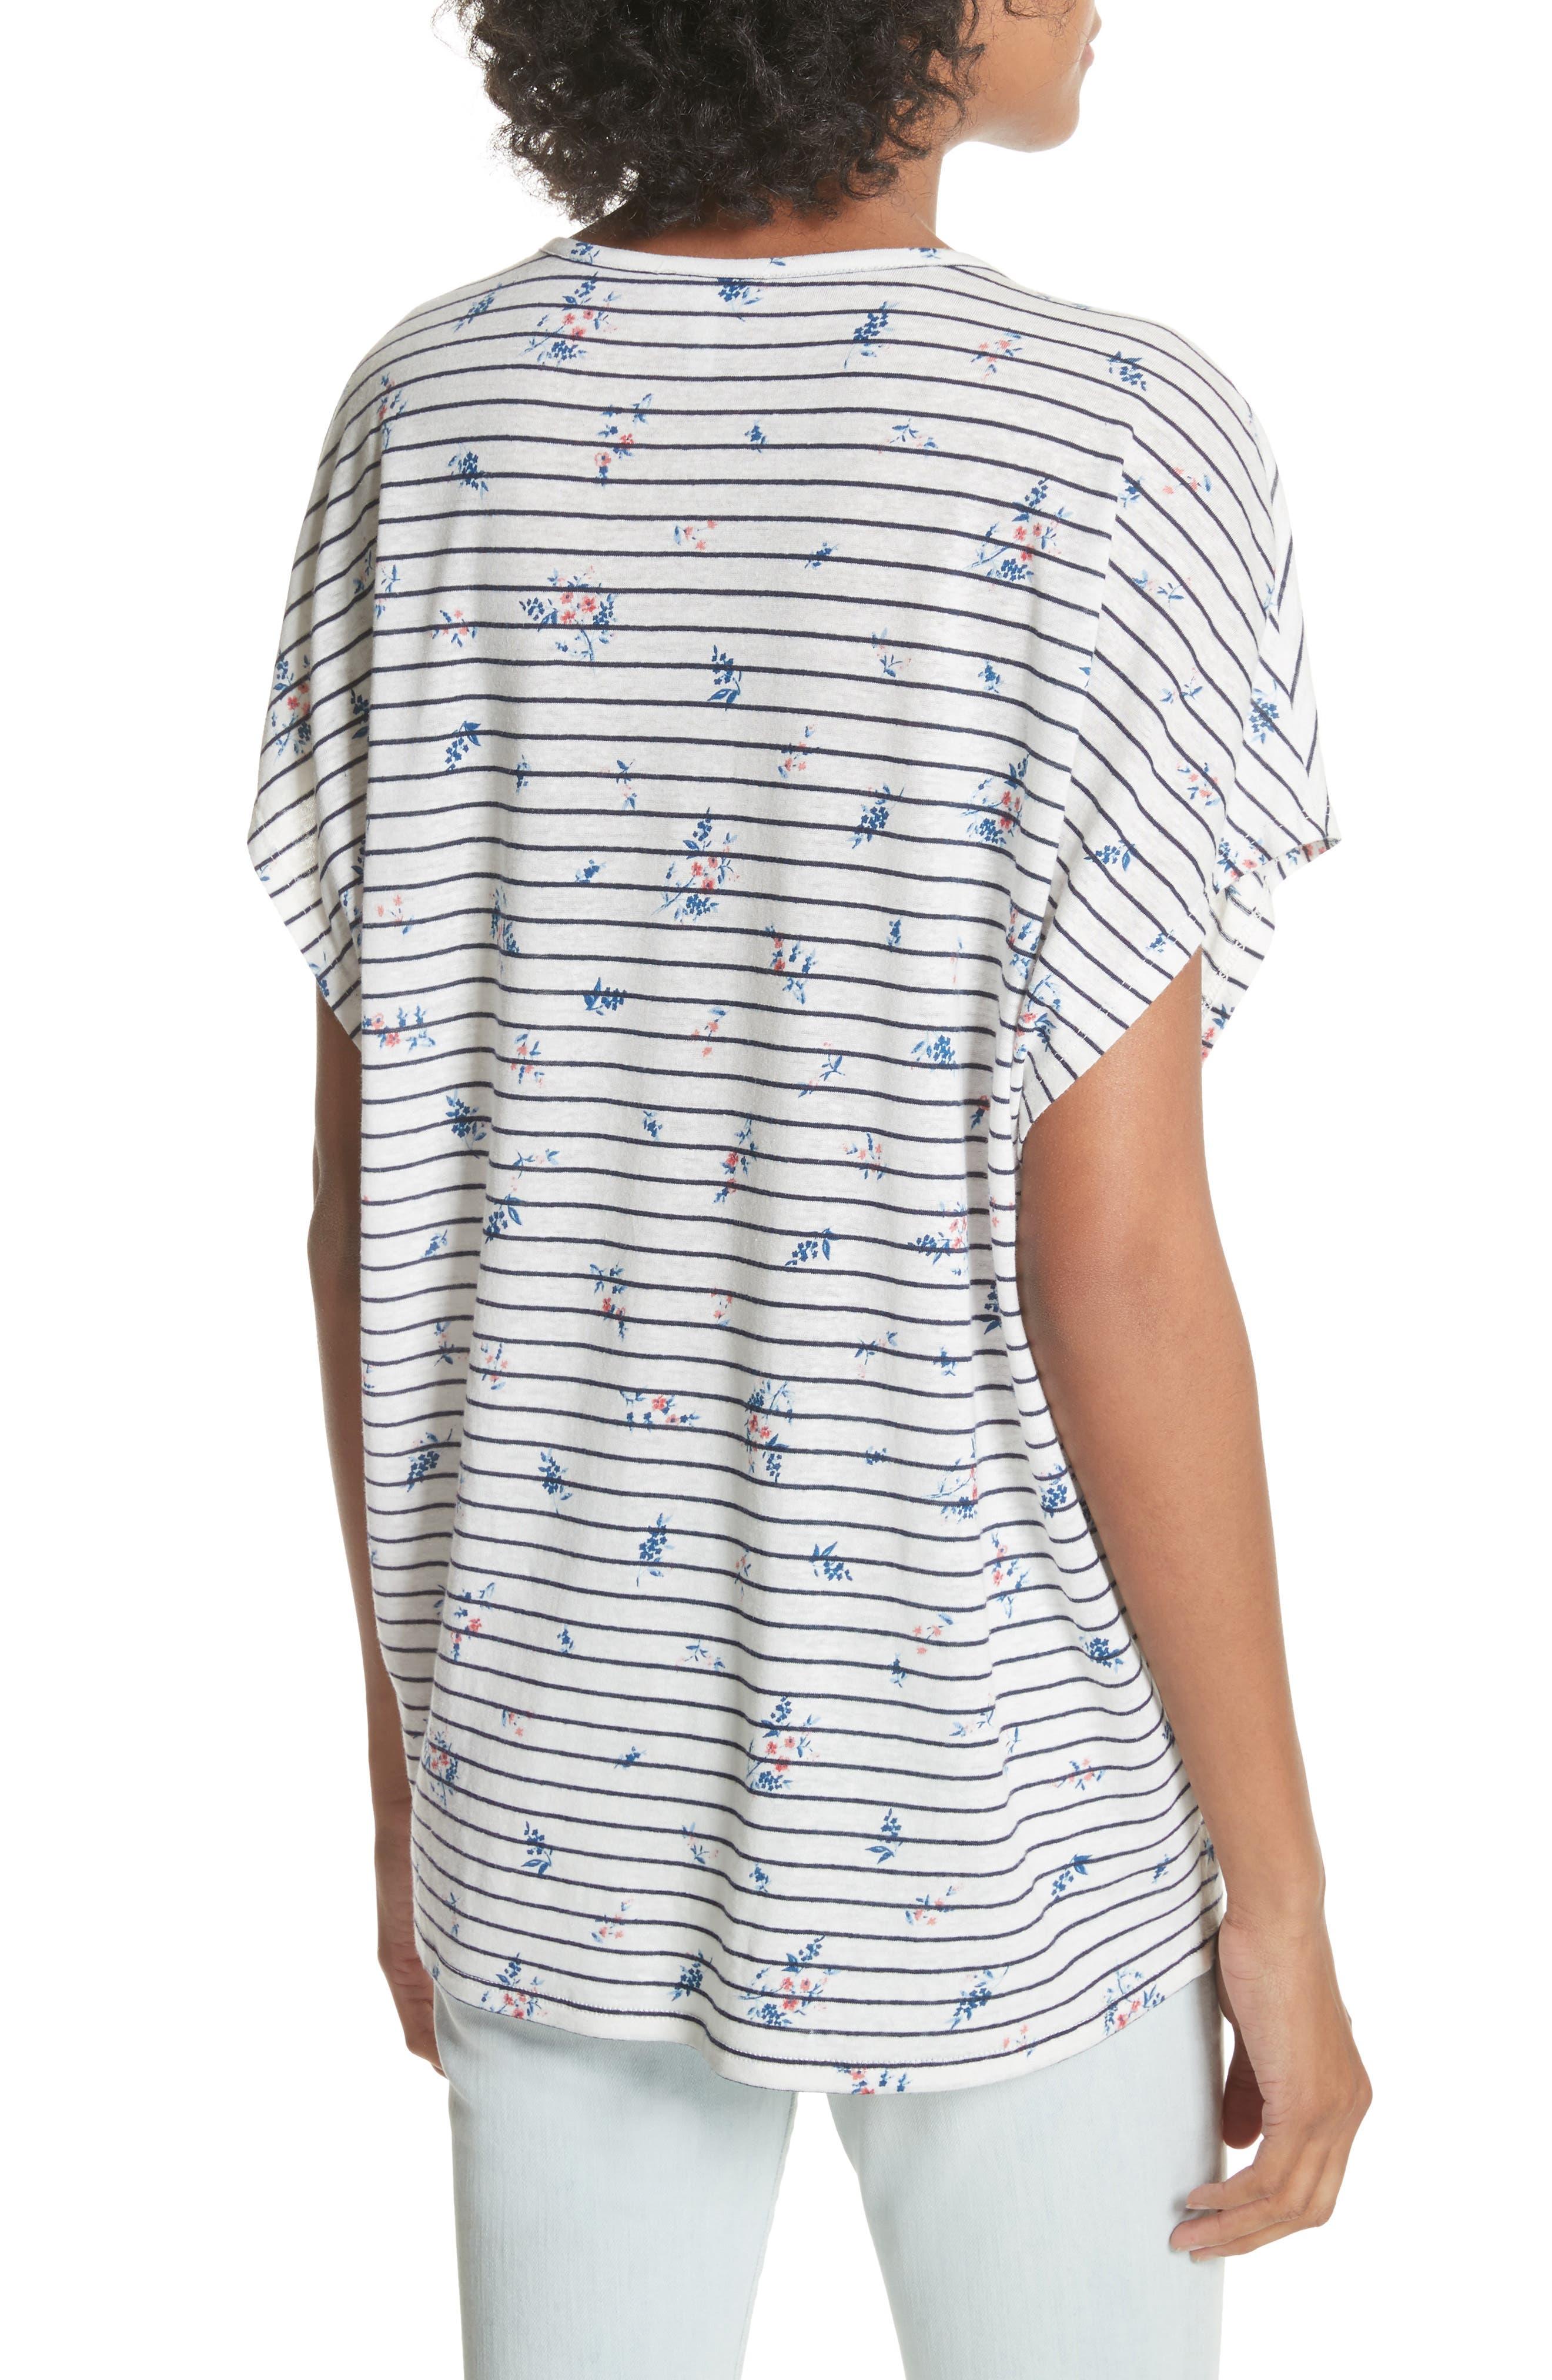 Riker Floral Stripe Linen Blend Top,                             Alternate thumbnail 2, color,                             131